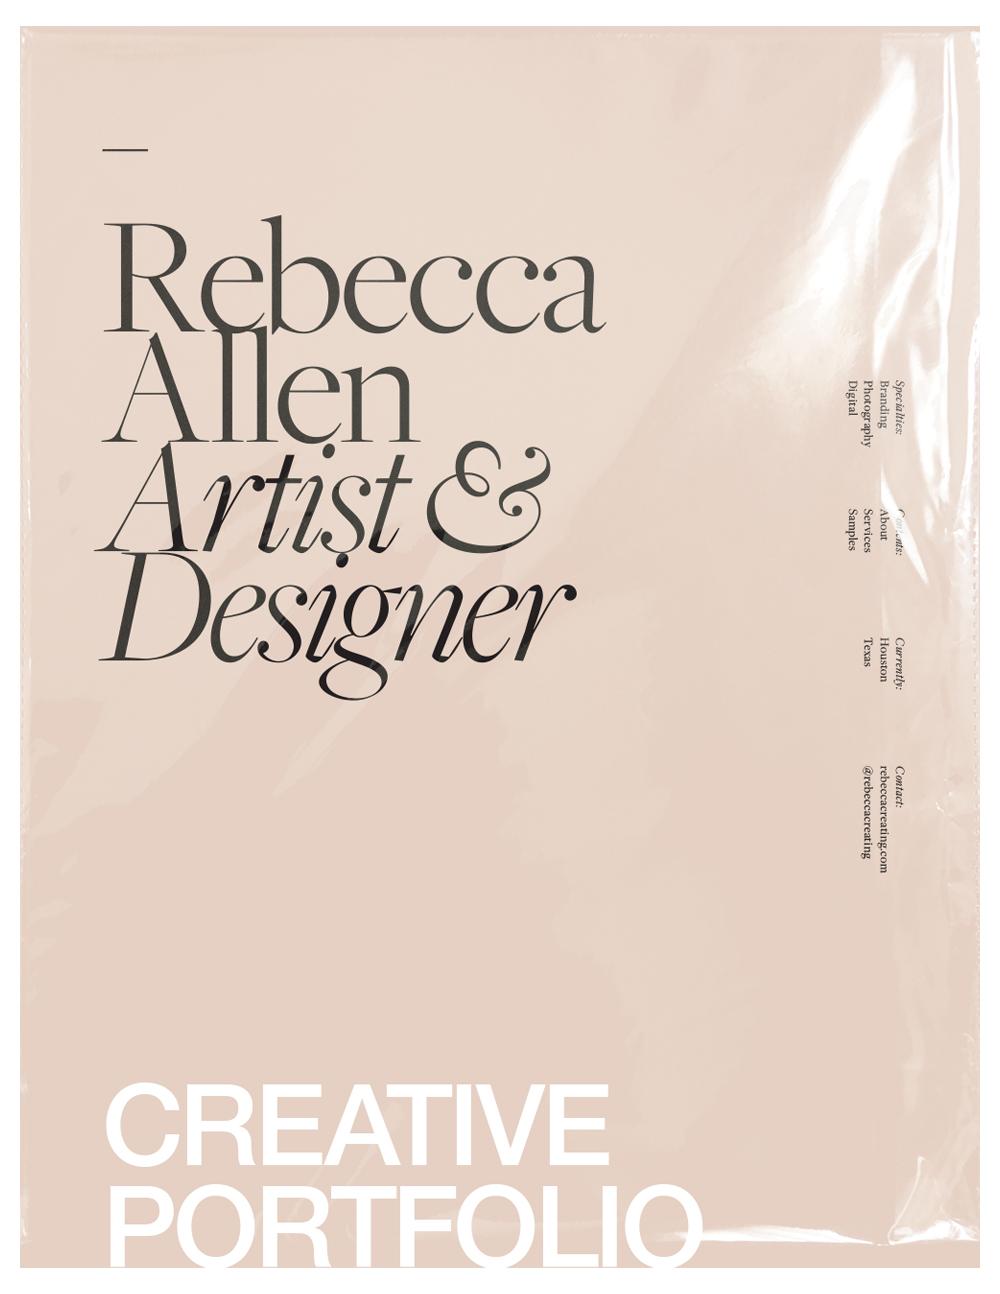 RebeccaAllen-Portfolio-01.jpg